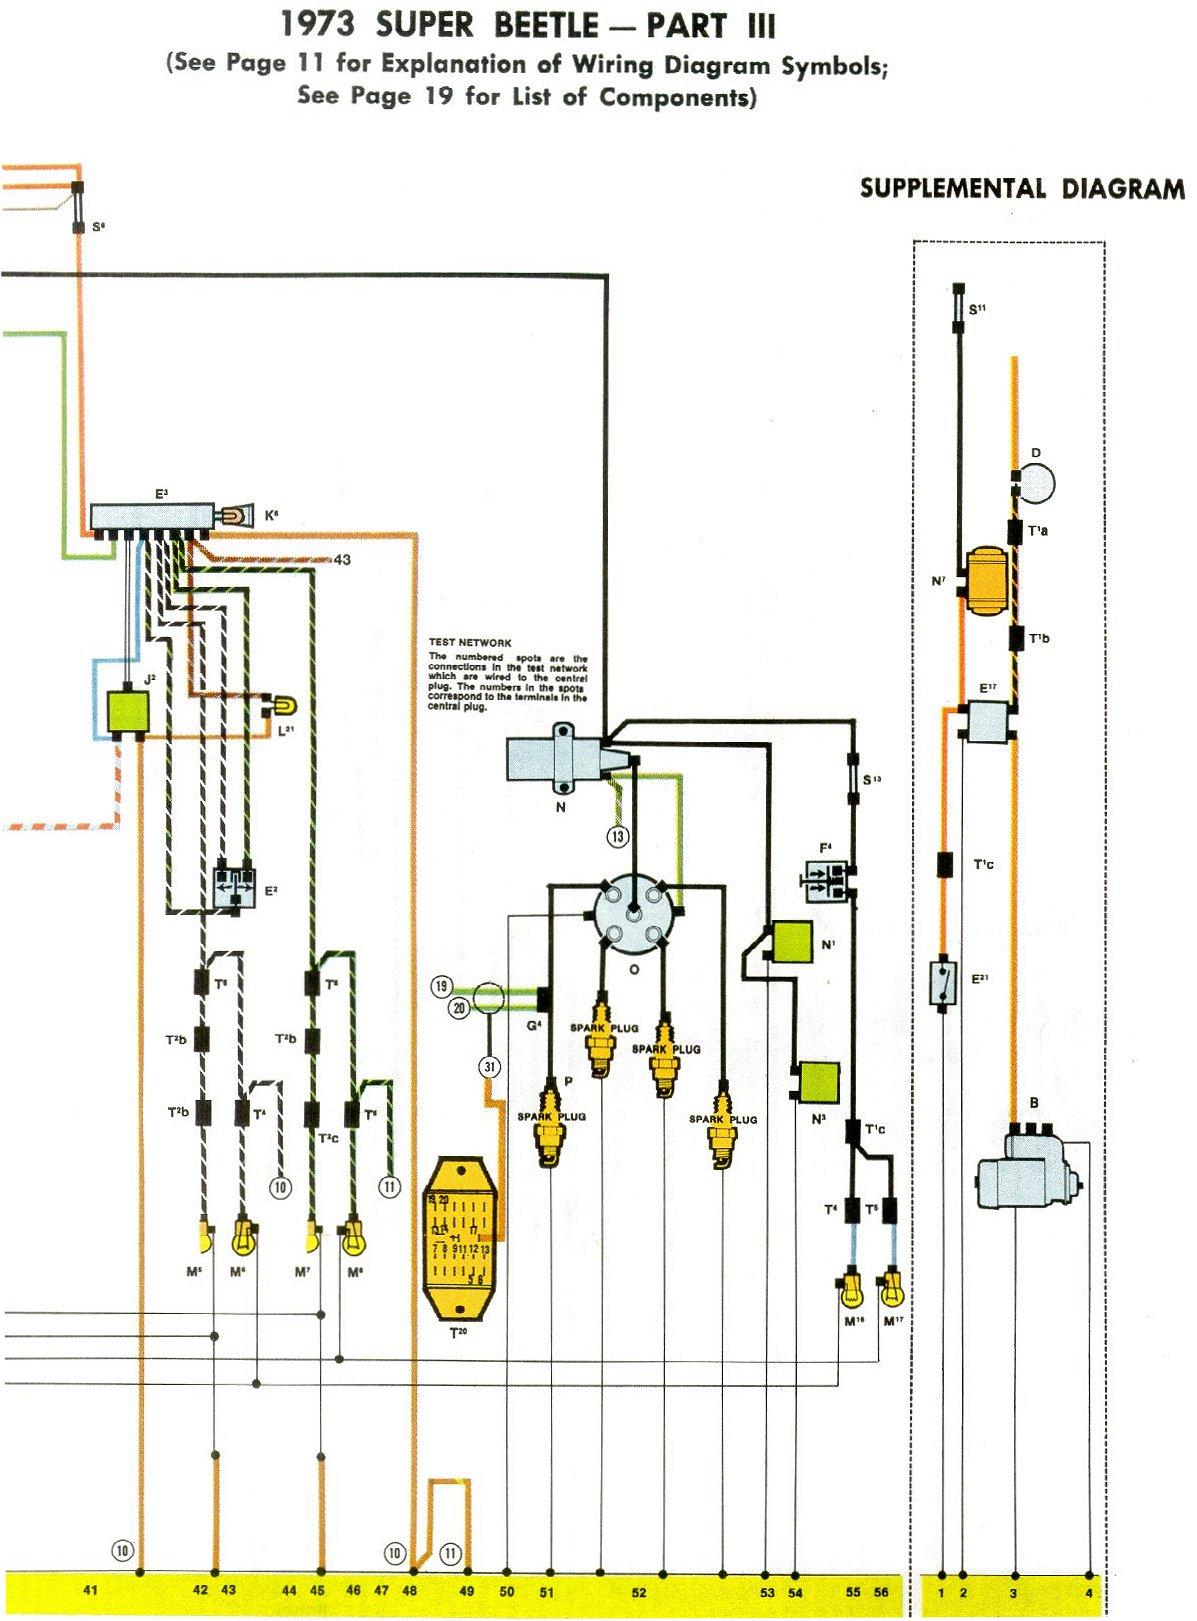 1973 Super Beetle Wiring Diagram   Thegoldenbug - 1973 Vw Beetle Wiring Diagram